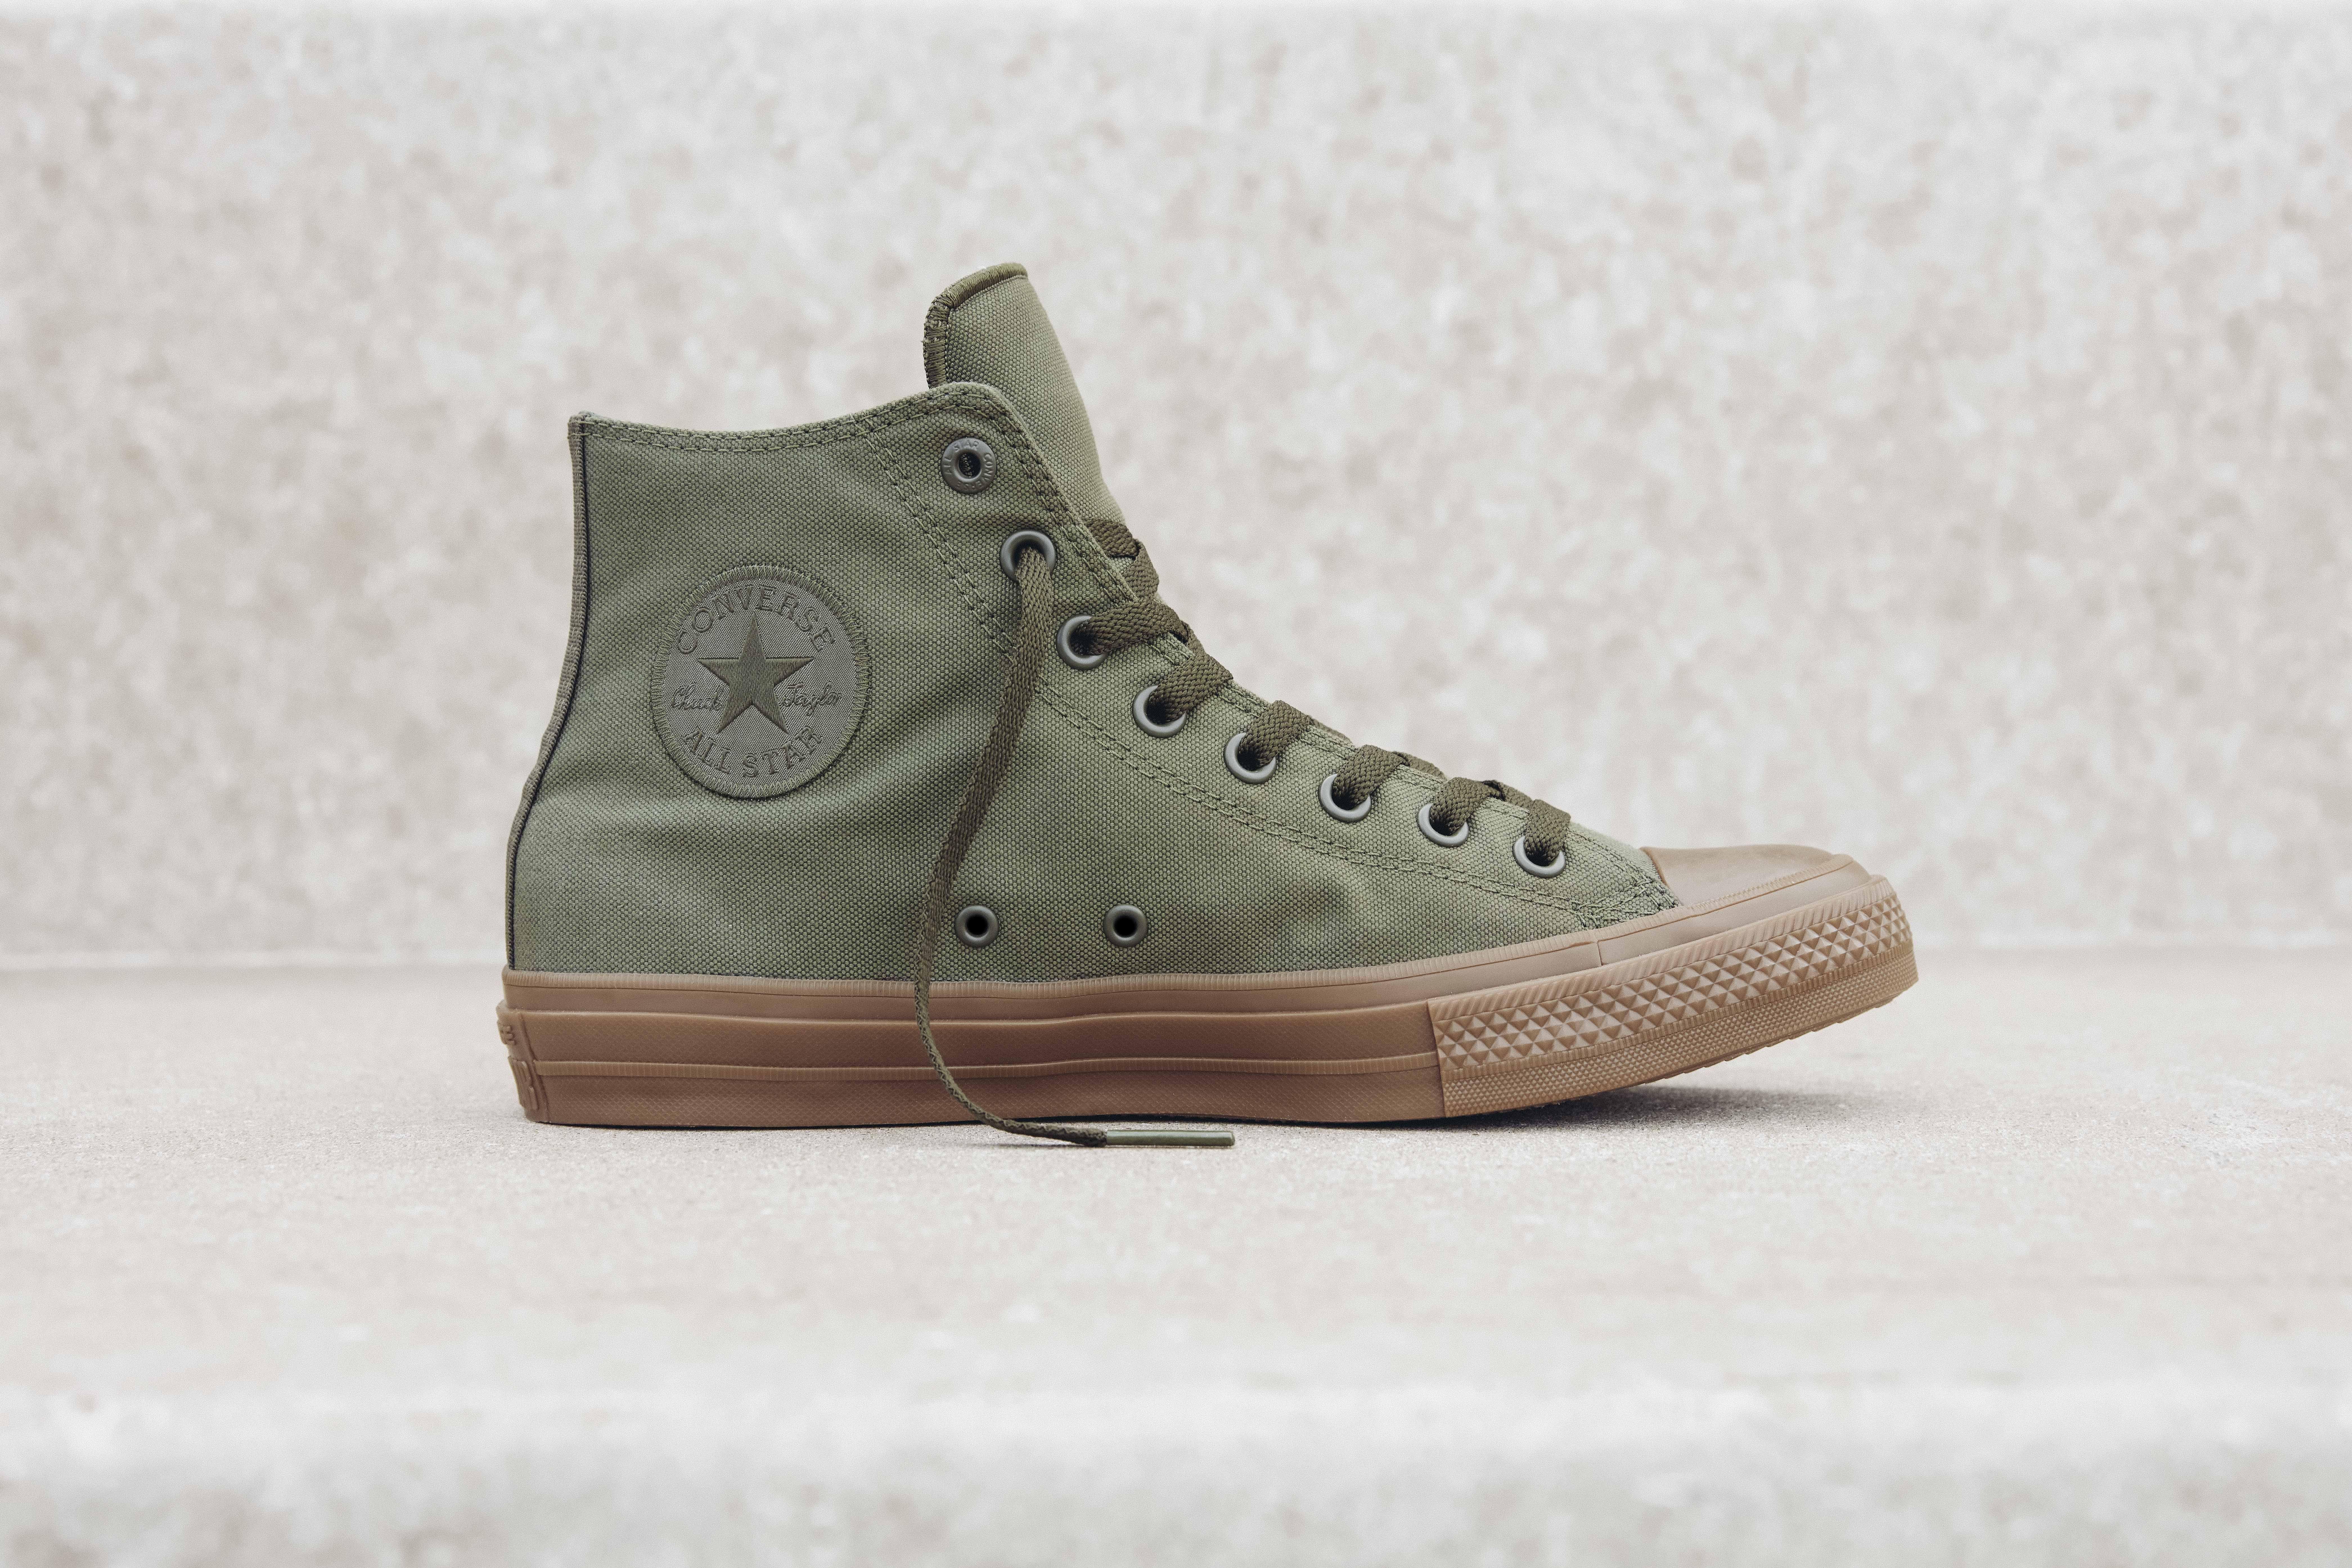 The Converse Chuck II Gum provides a